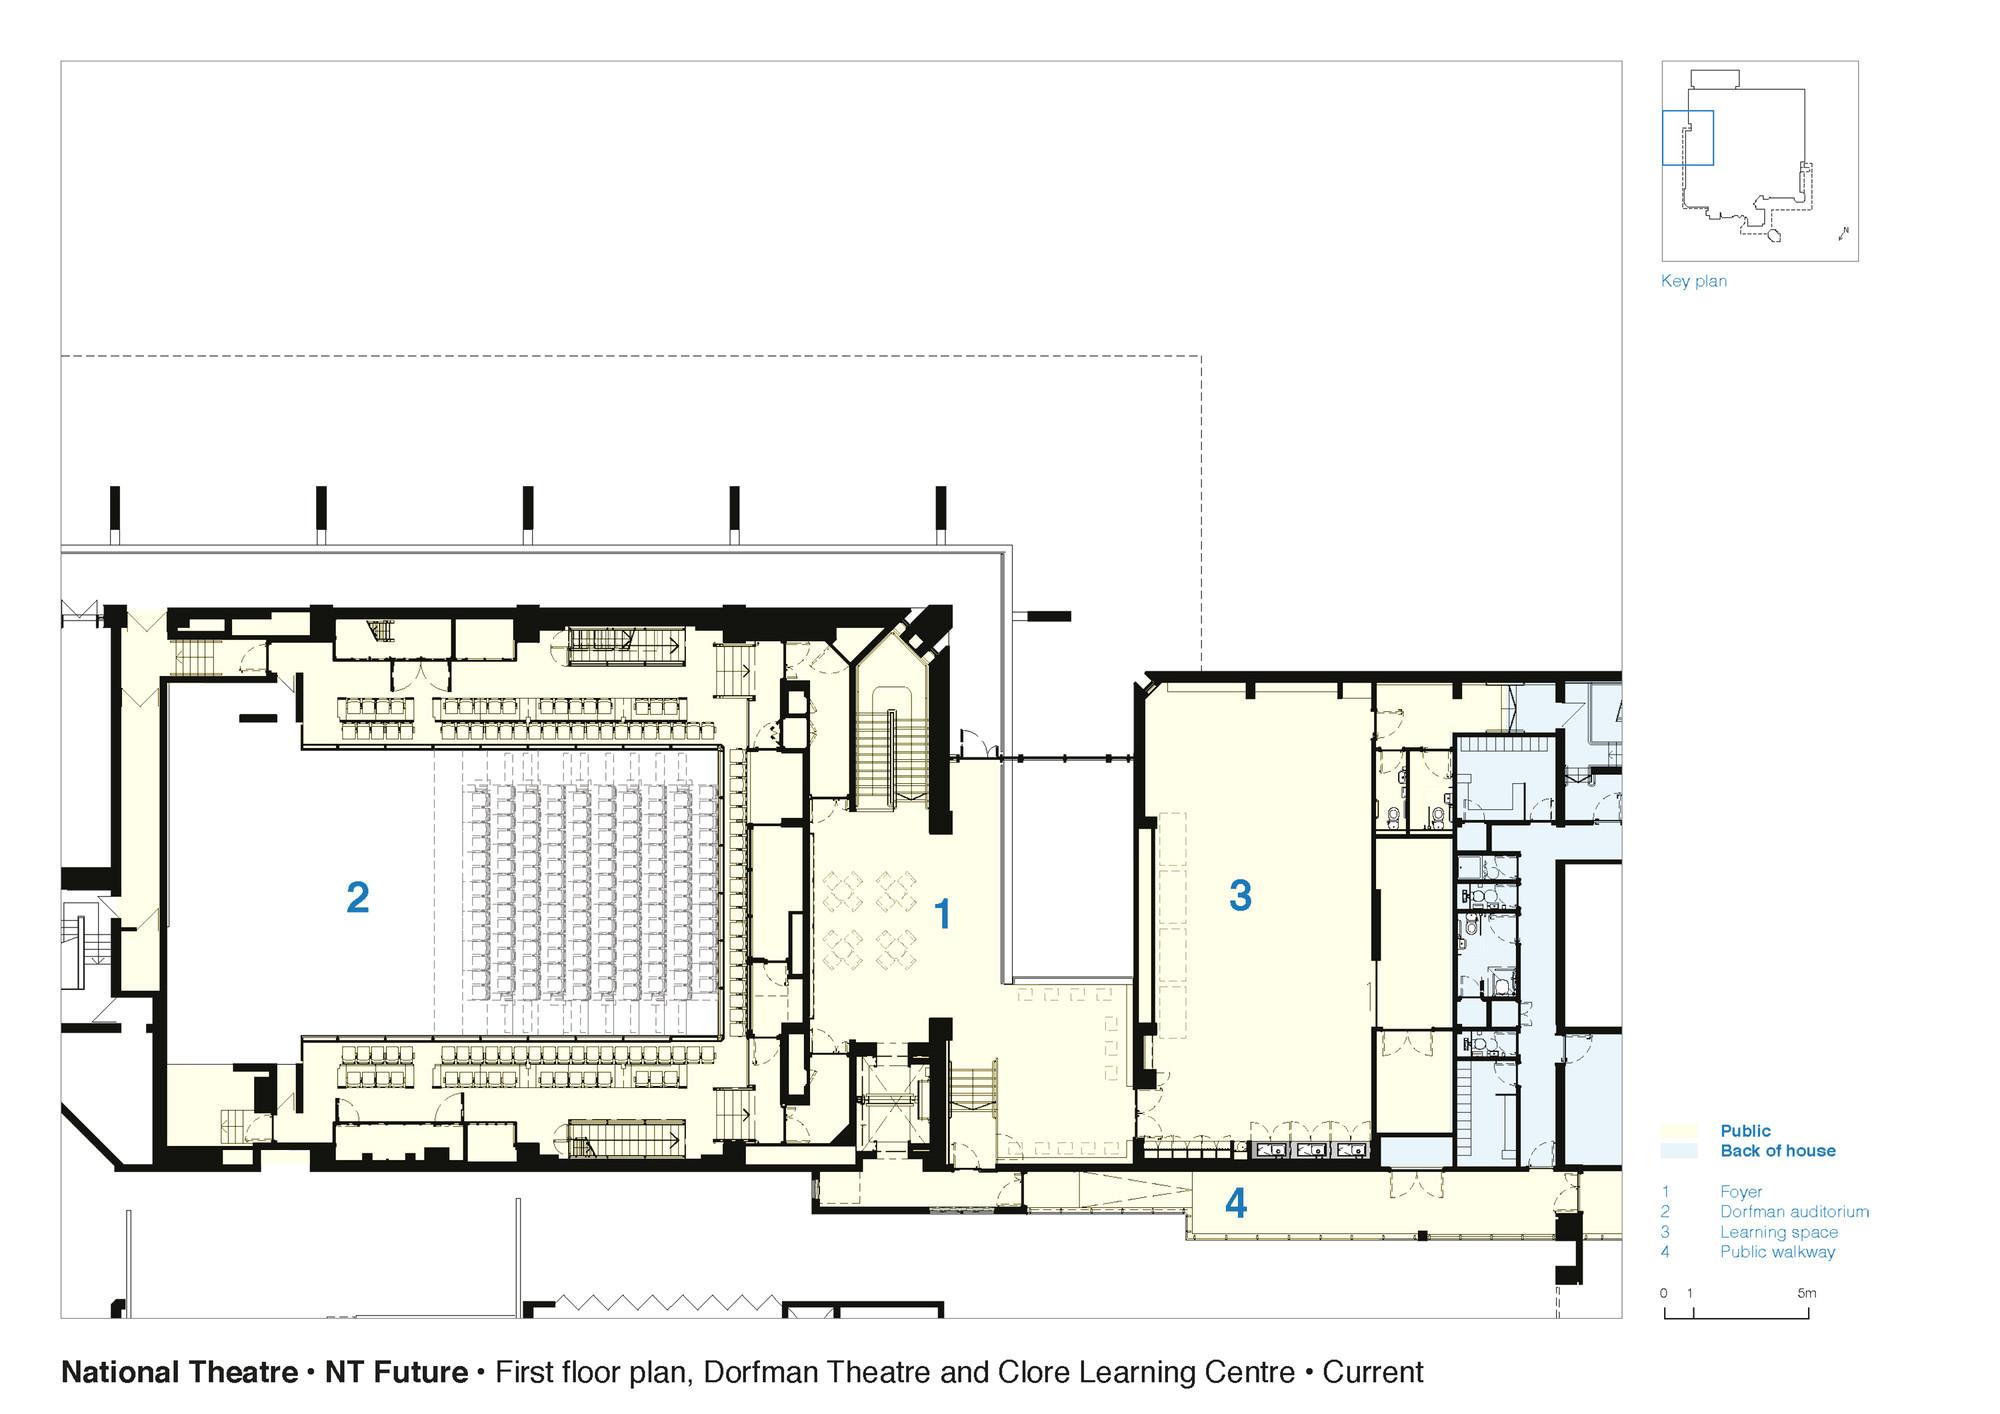 555bce6fe58ece6a9f0001b4 national theatre haworth tompkins first floor plan dorfman theatre